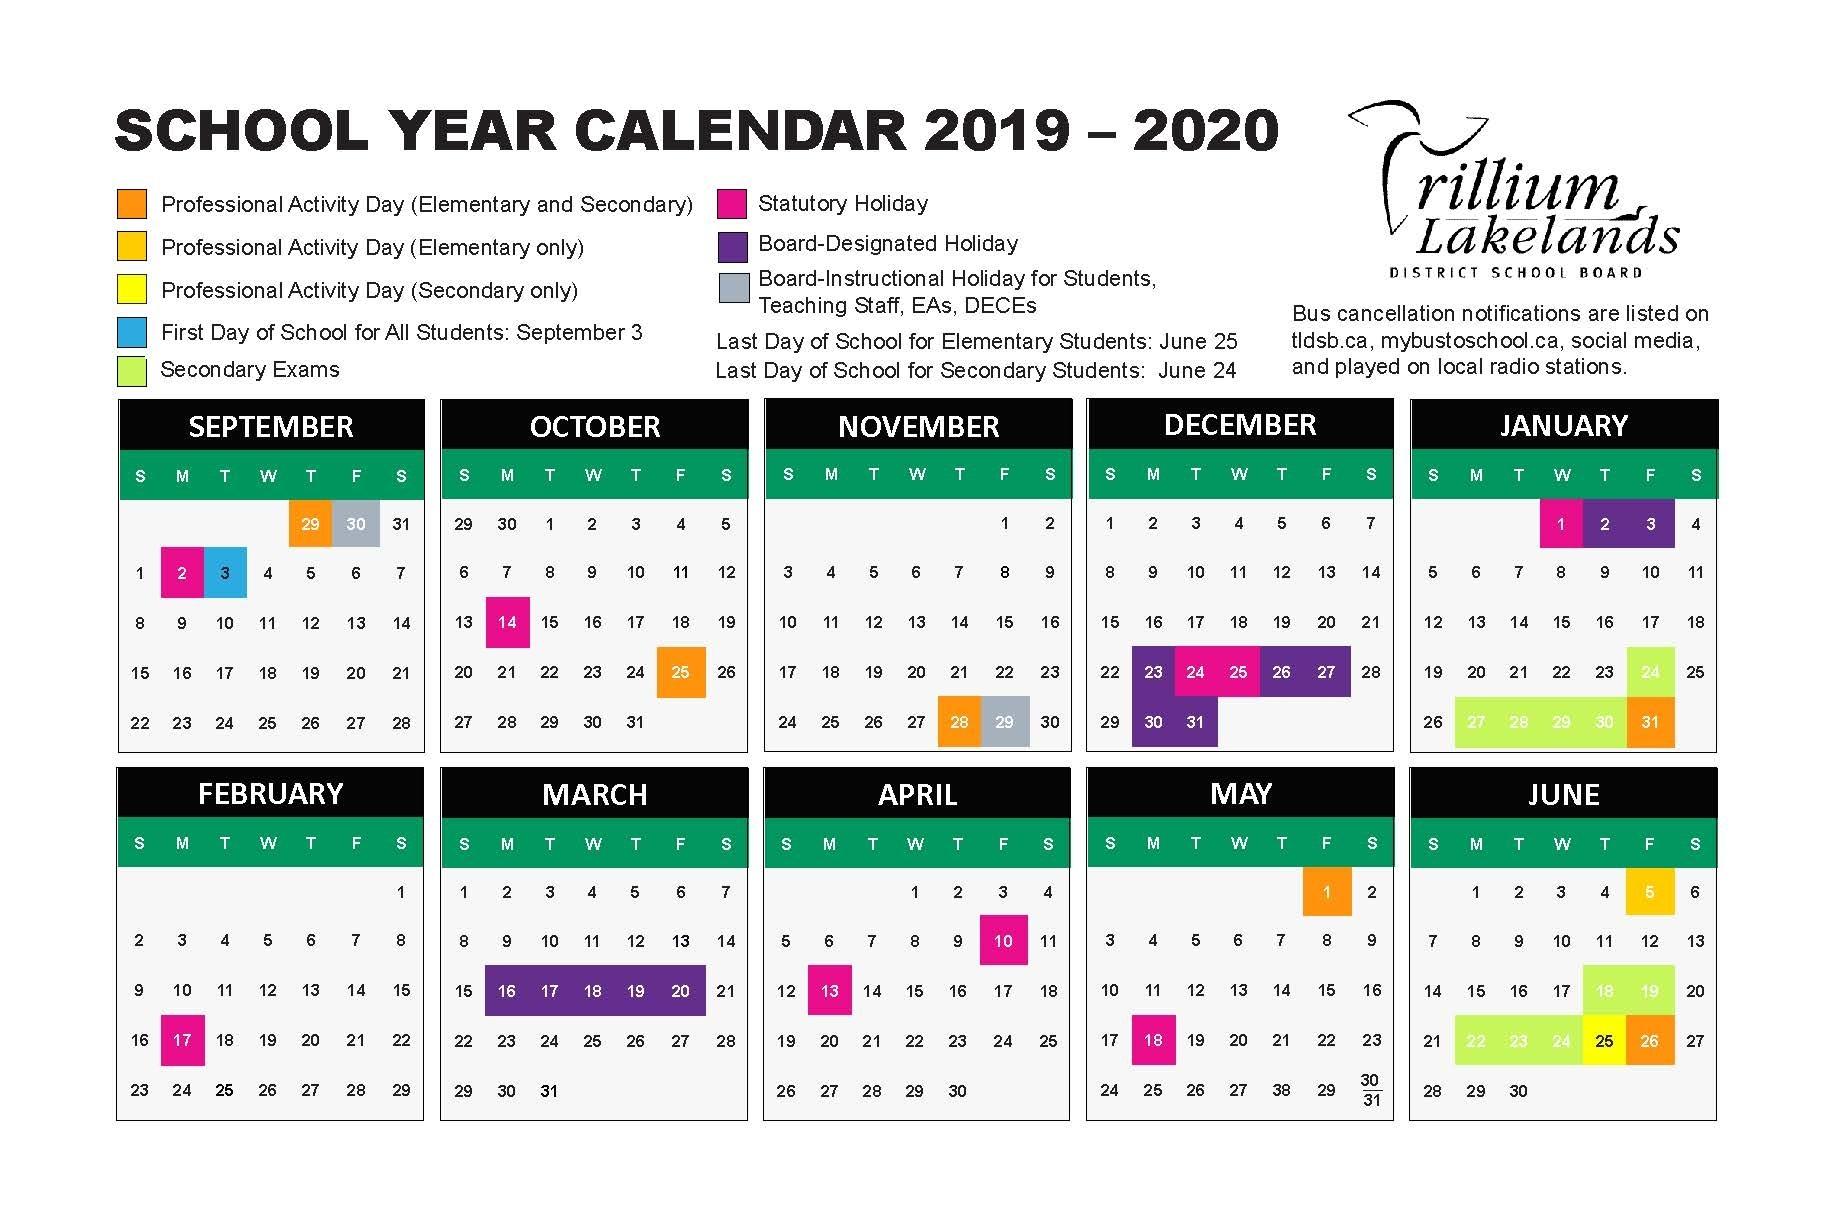 School Year Calendar – Trillium Lakelands District School Board with regard to U Of R 2020 Calendar